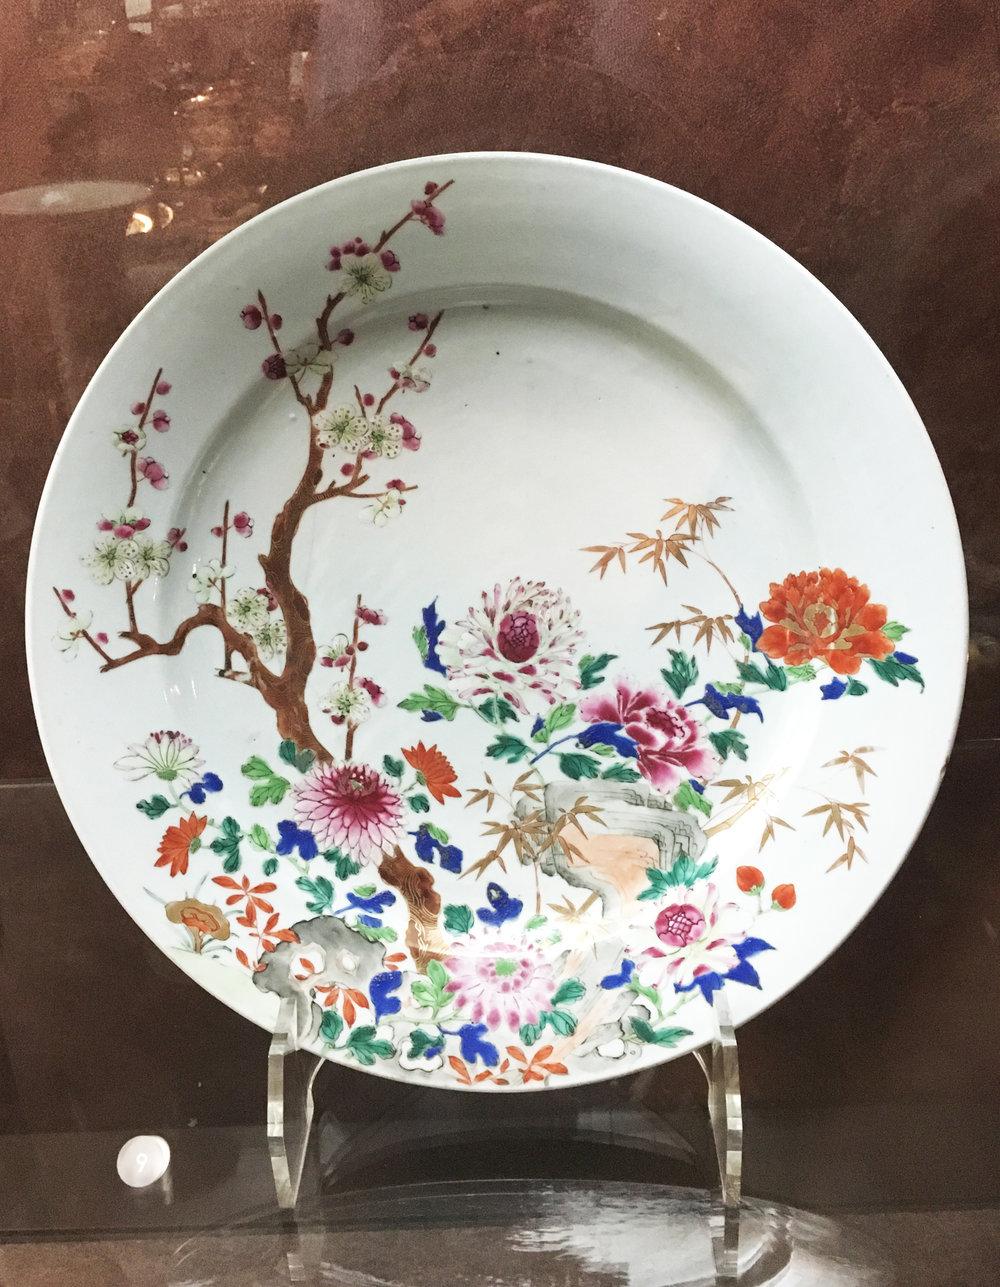 A Dish celebrating flowers, China, Qing dynasty, ca. 1730-1745, porcelain. In the Museu Calouste Gulbenkian, Lisboa. (Photograph J. Cook)